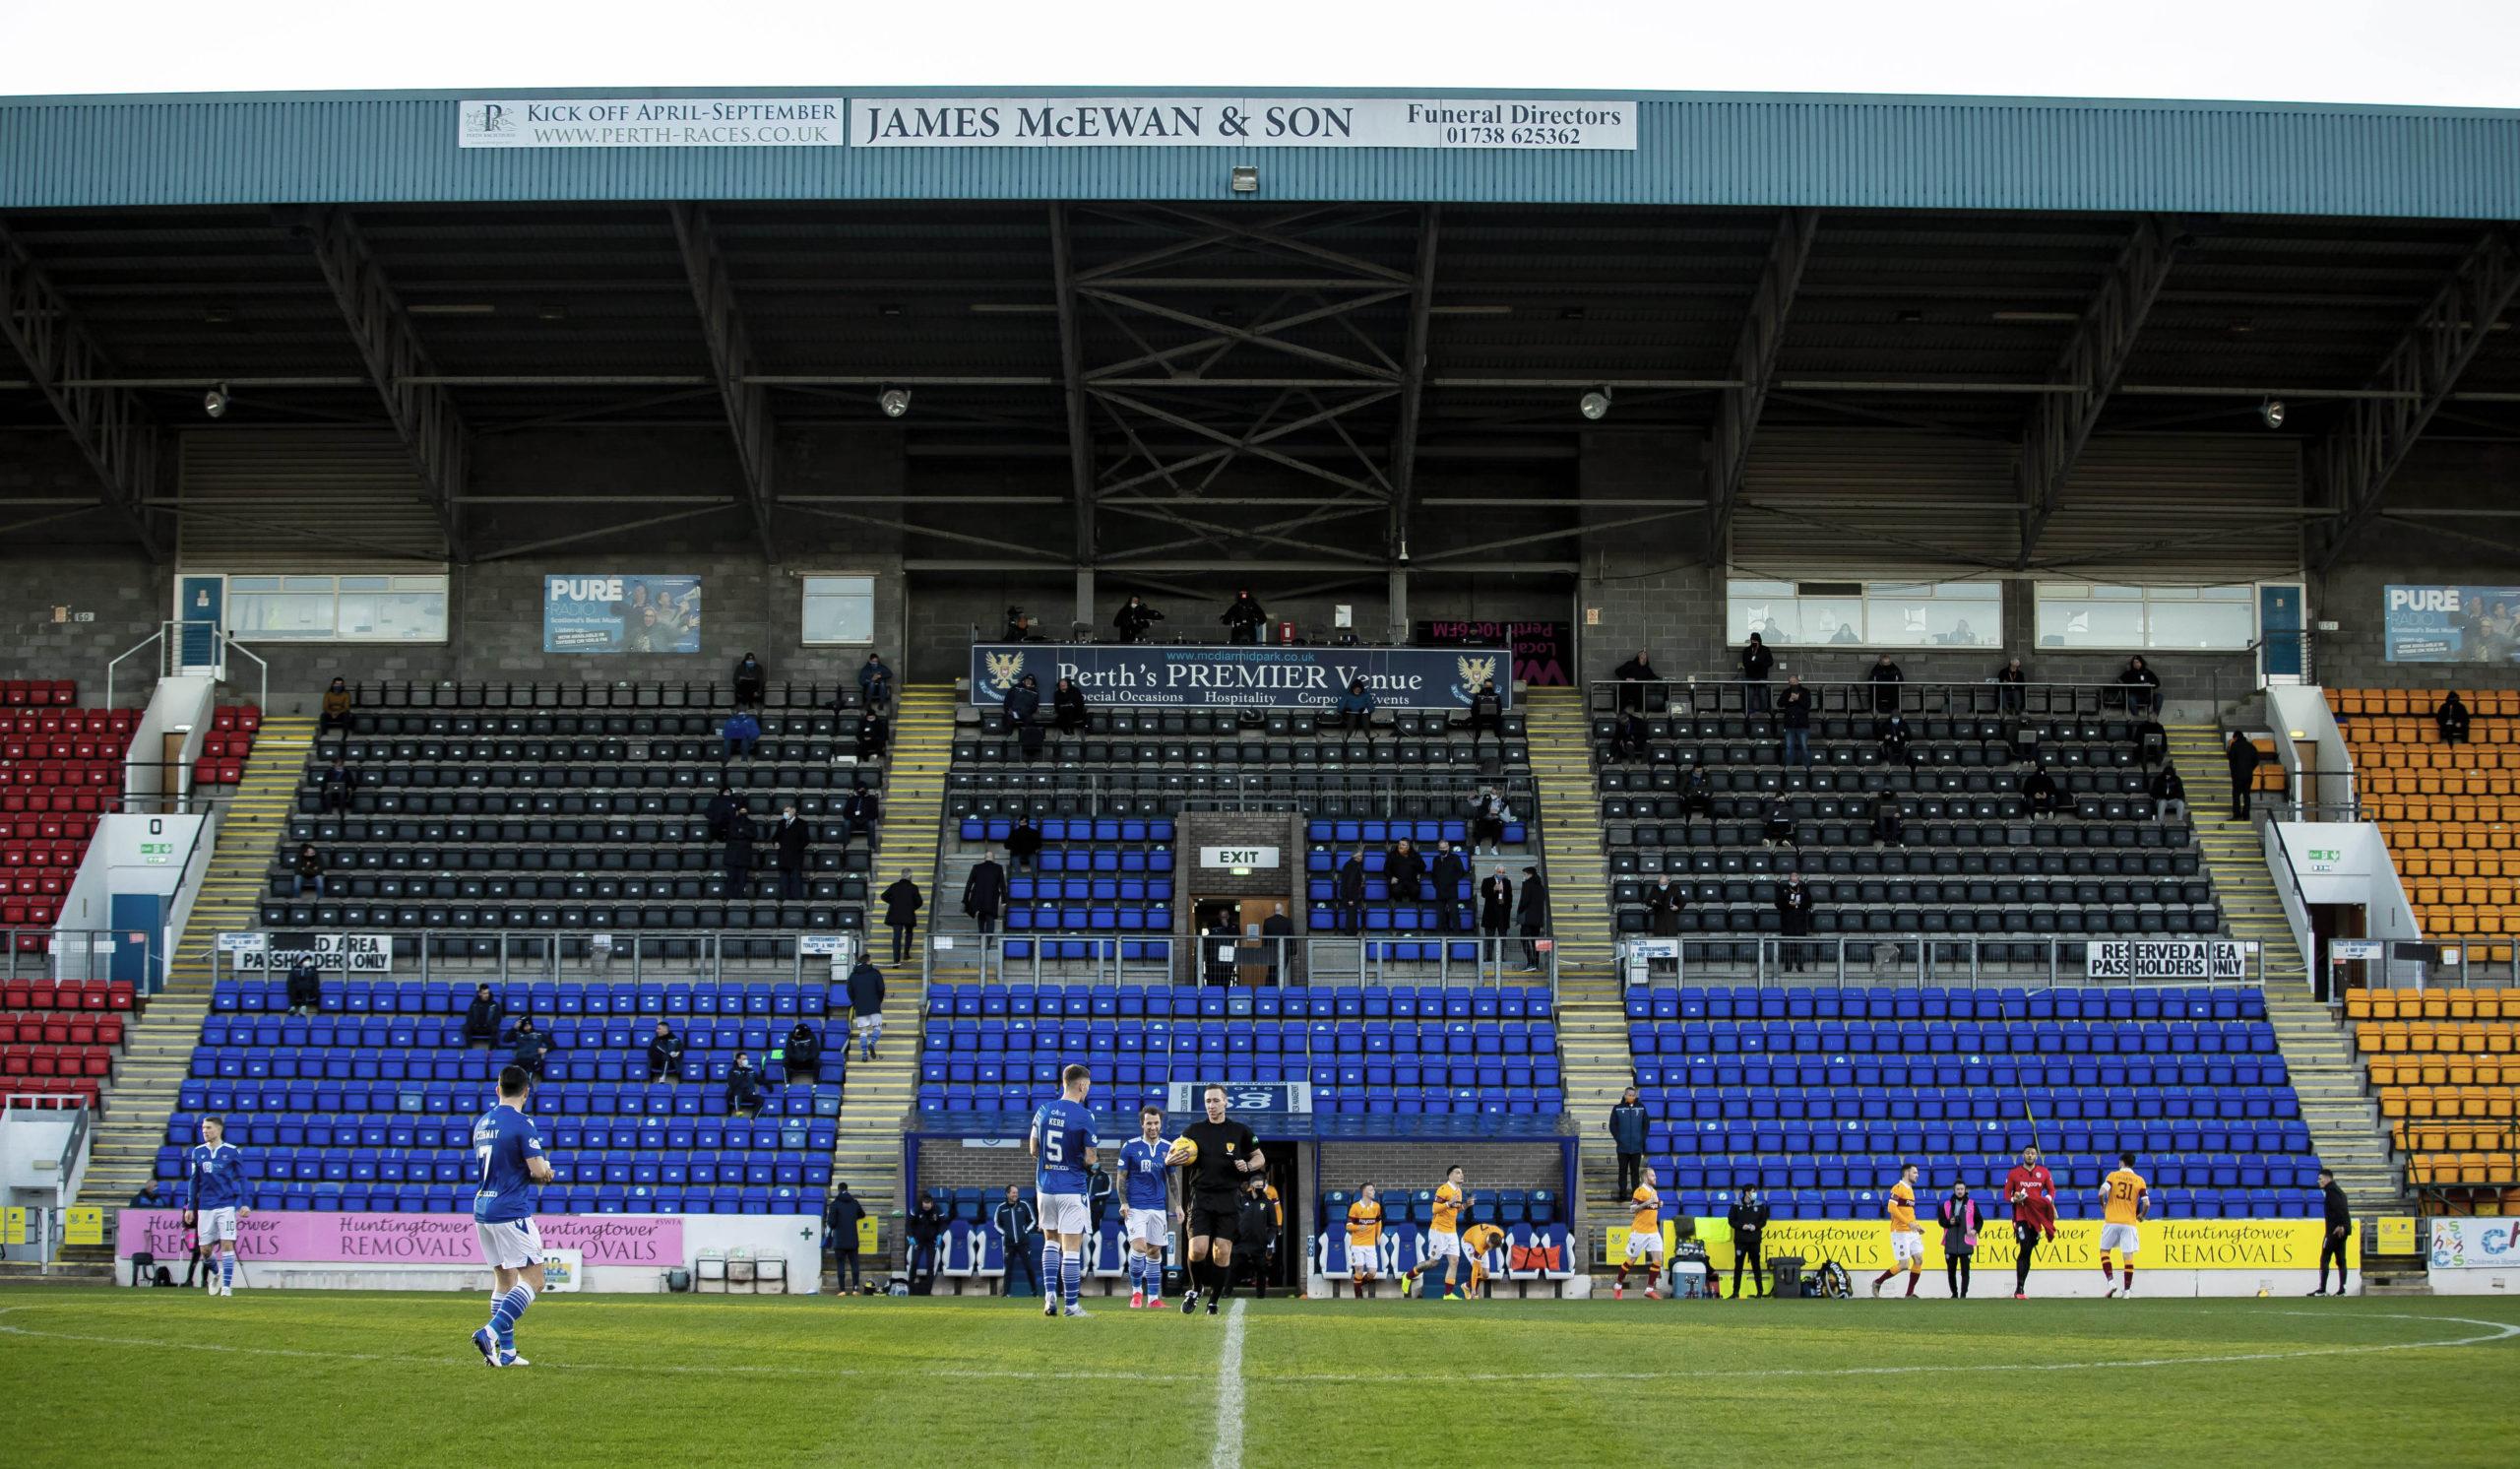 St Johnstone vs Motherwell had no fans